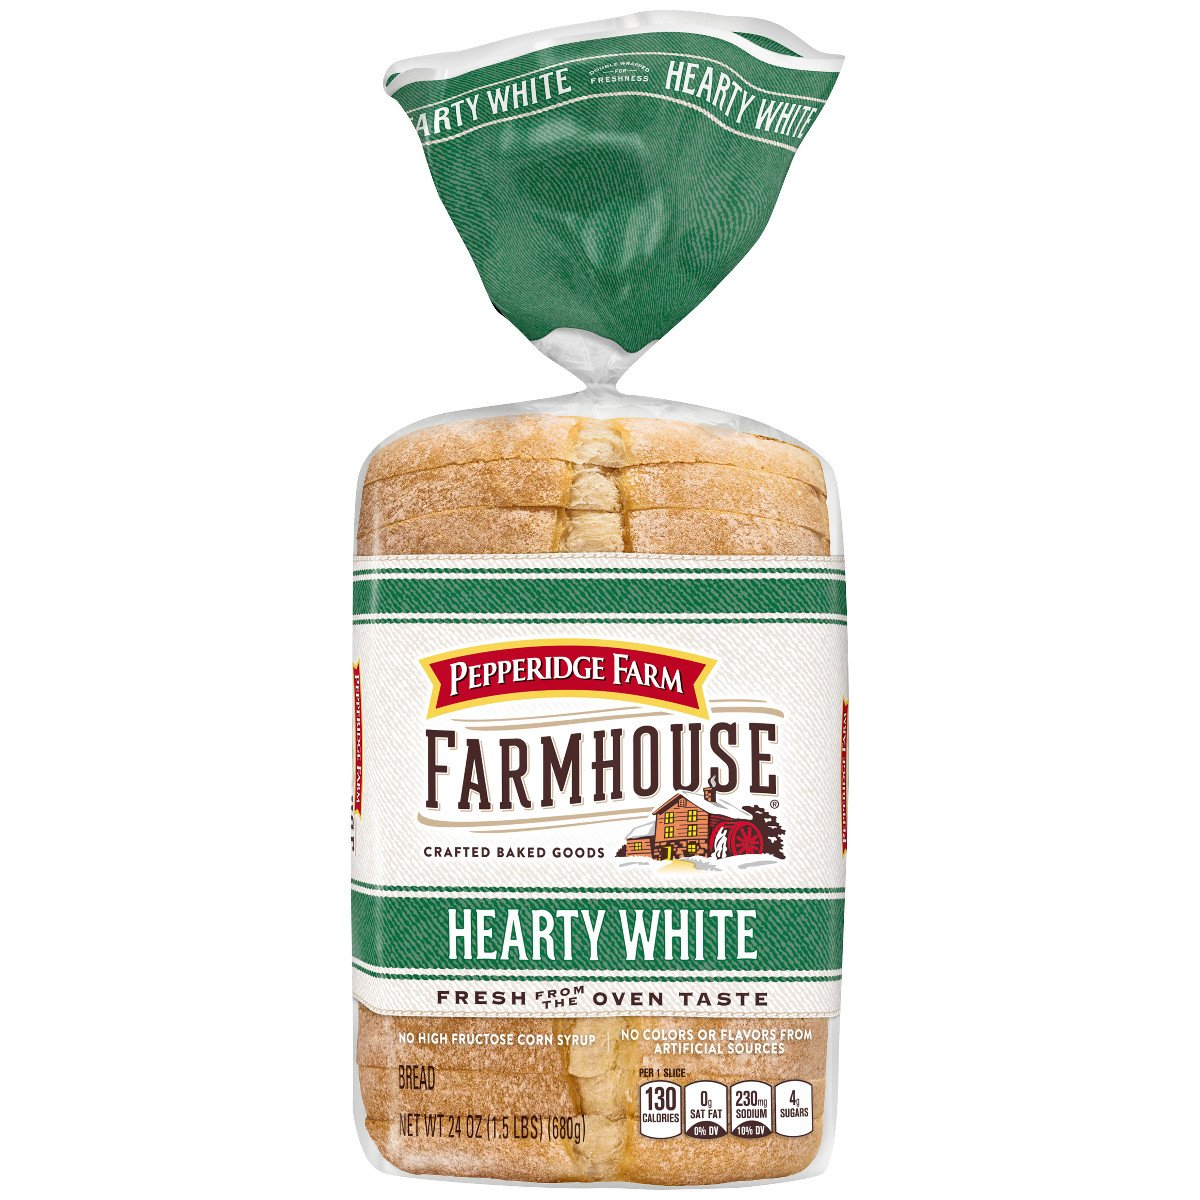 Pepperidge Farm Farmhouse Hearty White Bread, 24 oz. Bag